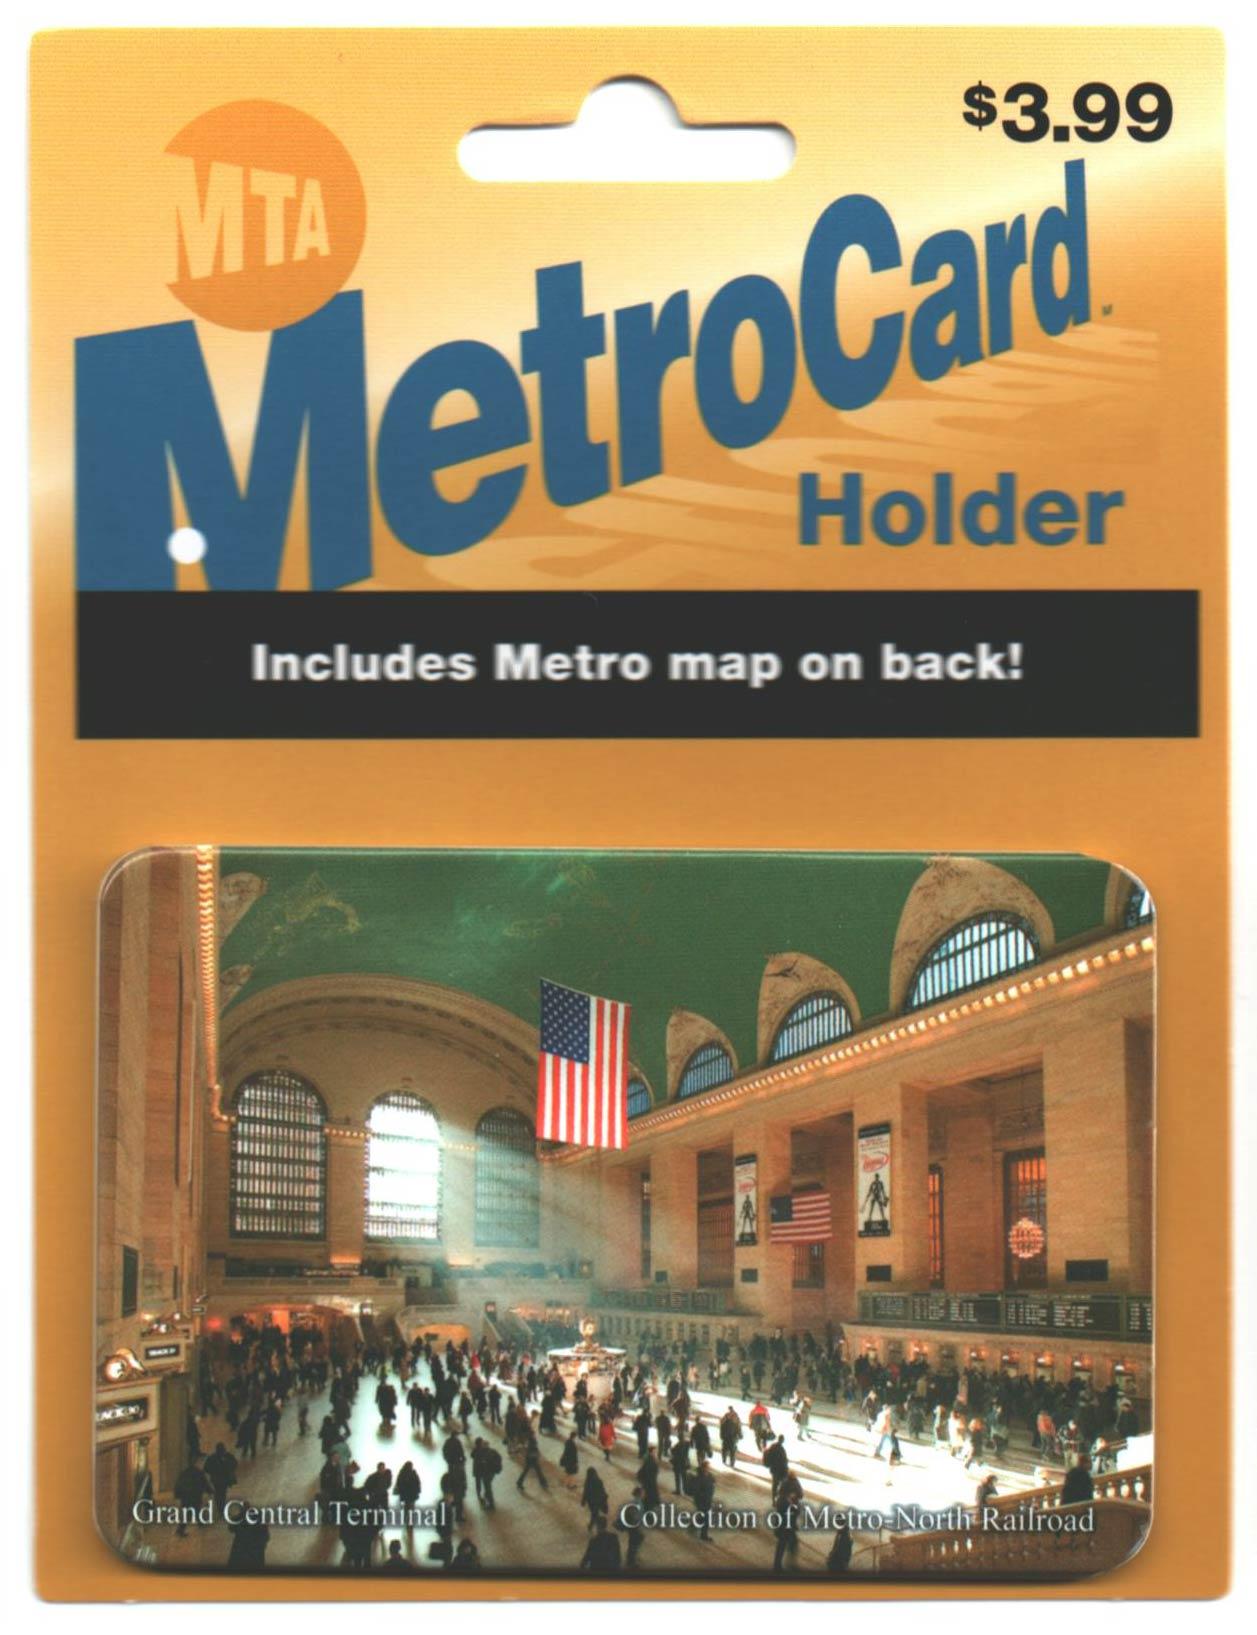 metrocard-holder-mta